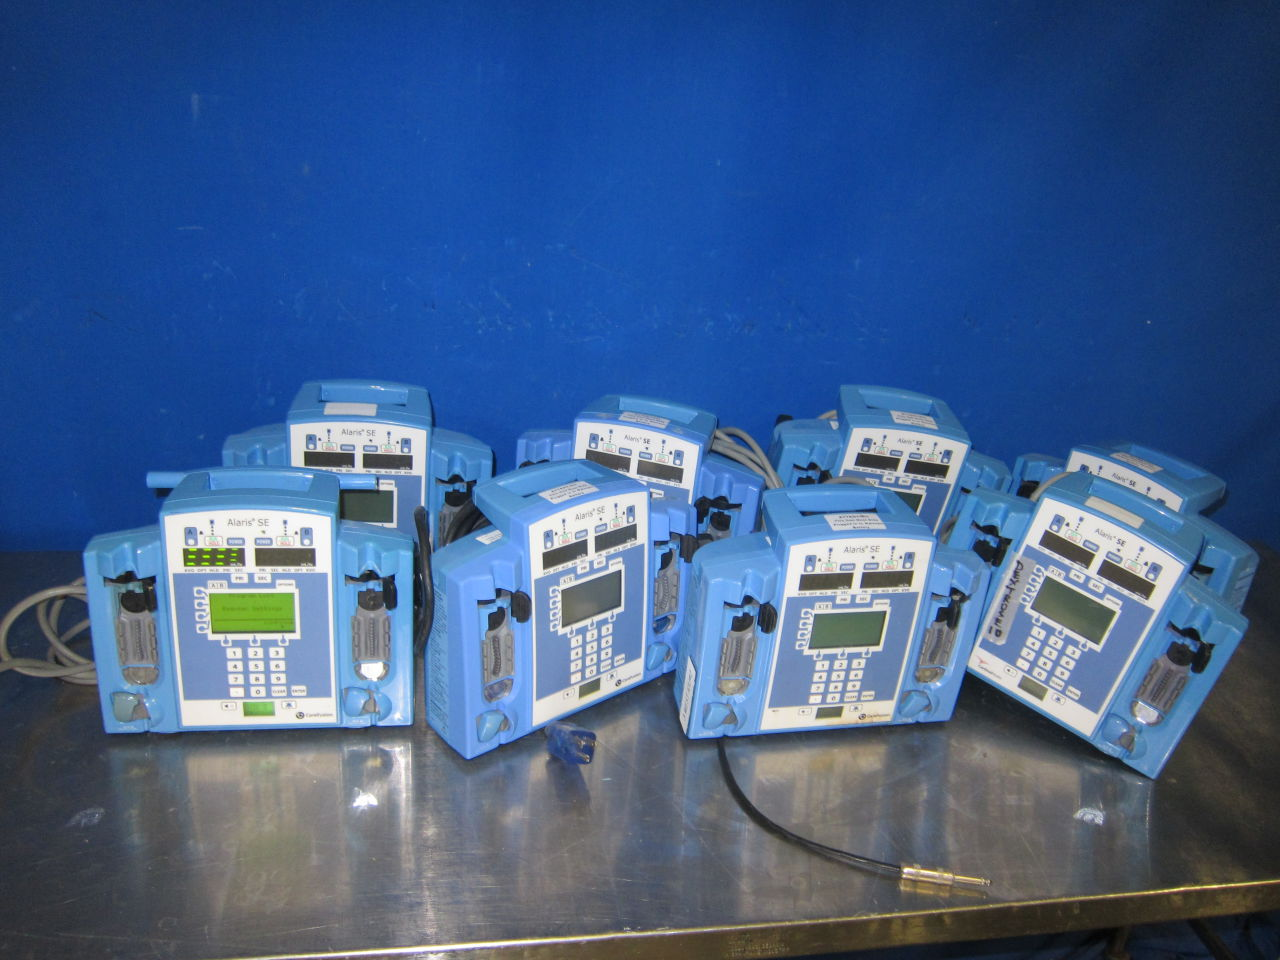 CARDINAL HEALTH CAREFUSION ALARIS SE 7230  - Lot of 8 Pump IV Infusion